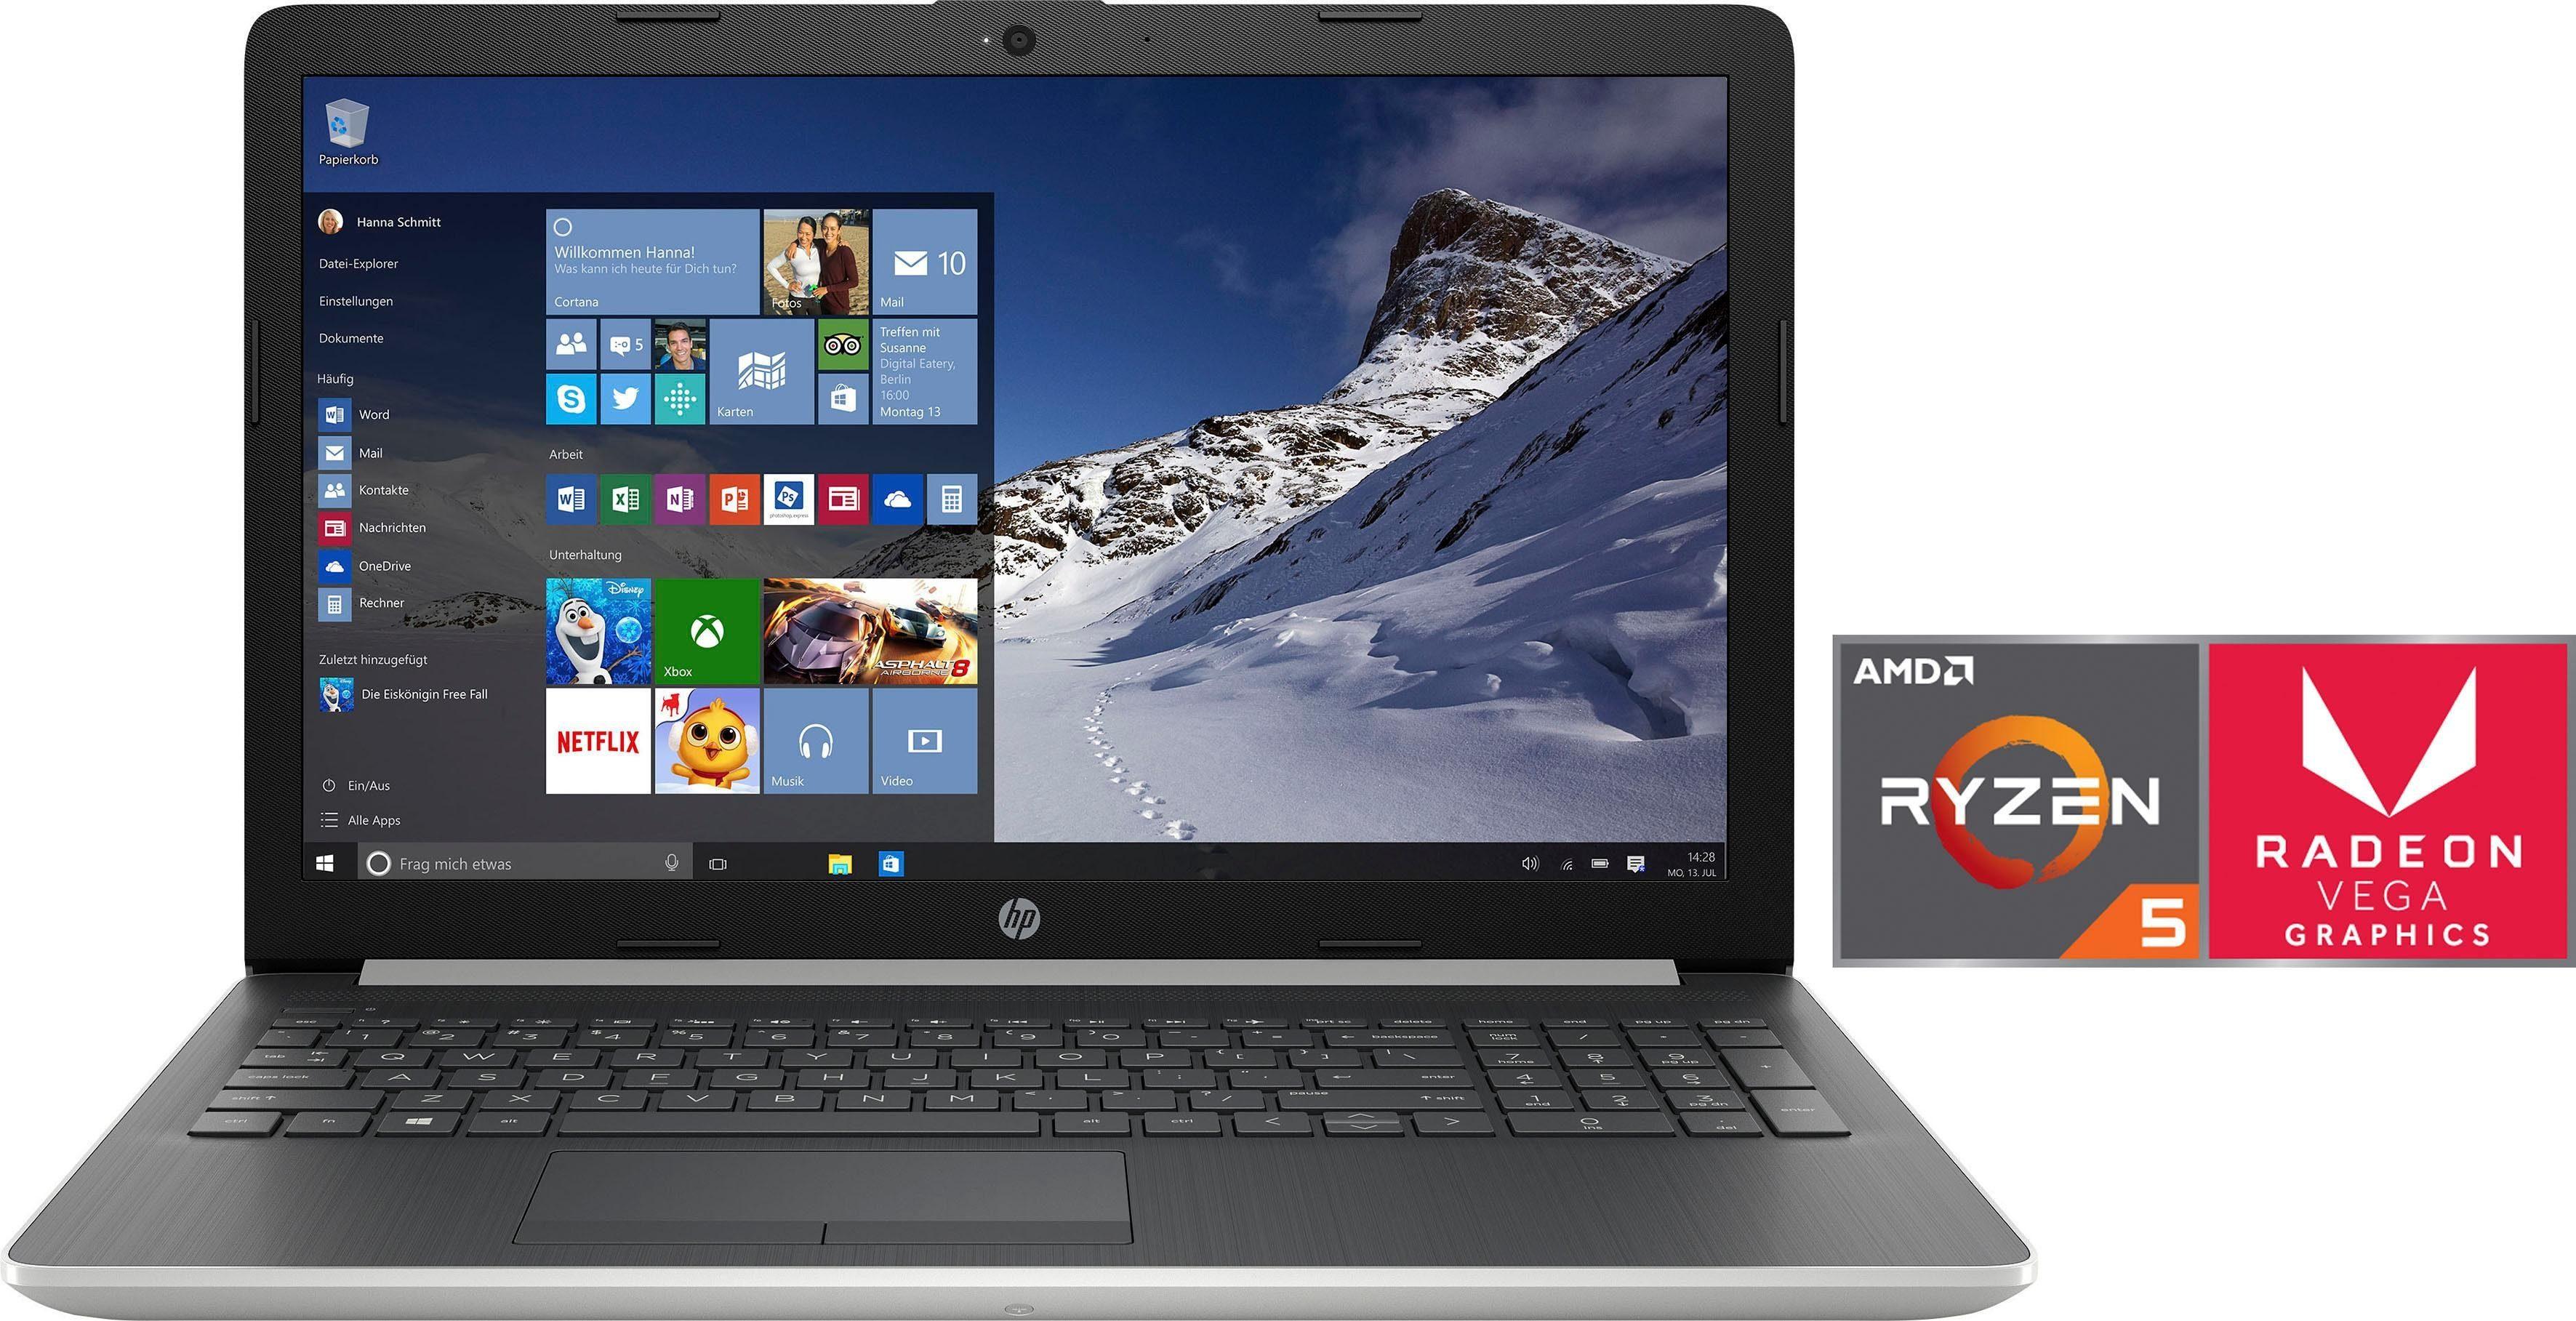 HP 15-db0009ng Notebook (39,6 cm/15,6 Zoll, AMD Ryzen 5, 1000 GB HDD, 128 GB SSD, inkl. Office 365 Personal (ESD)